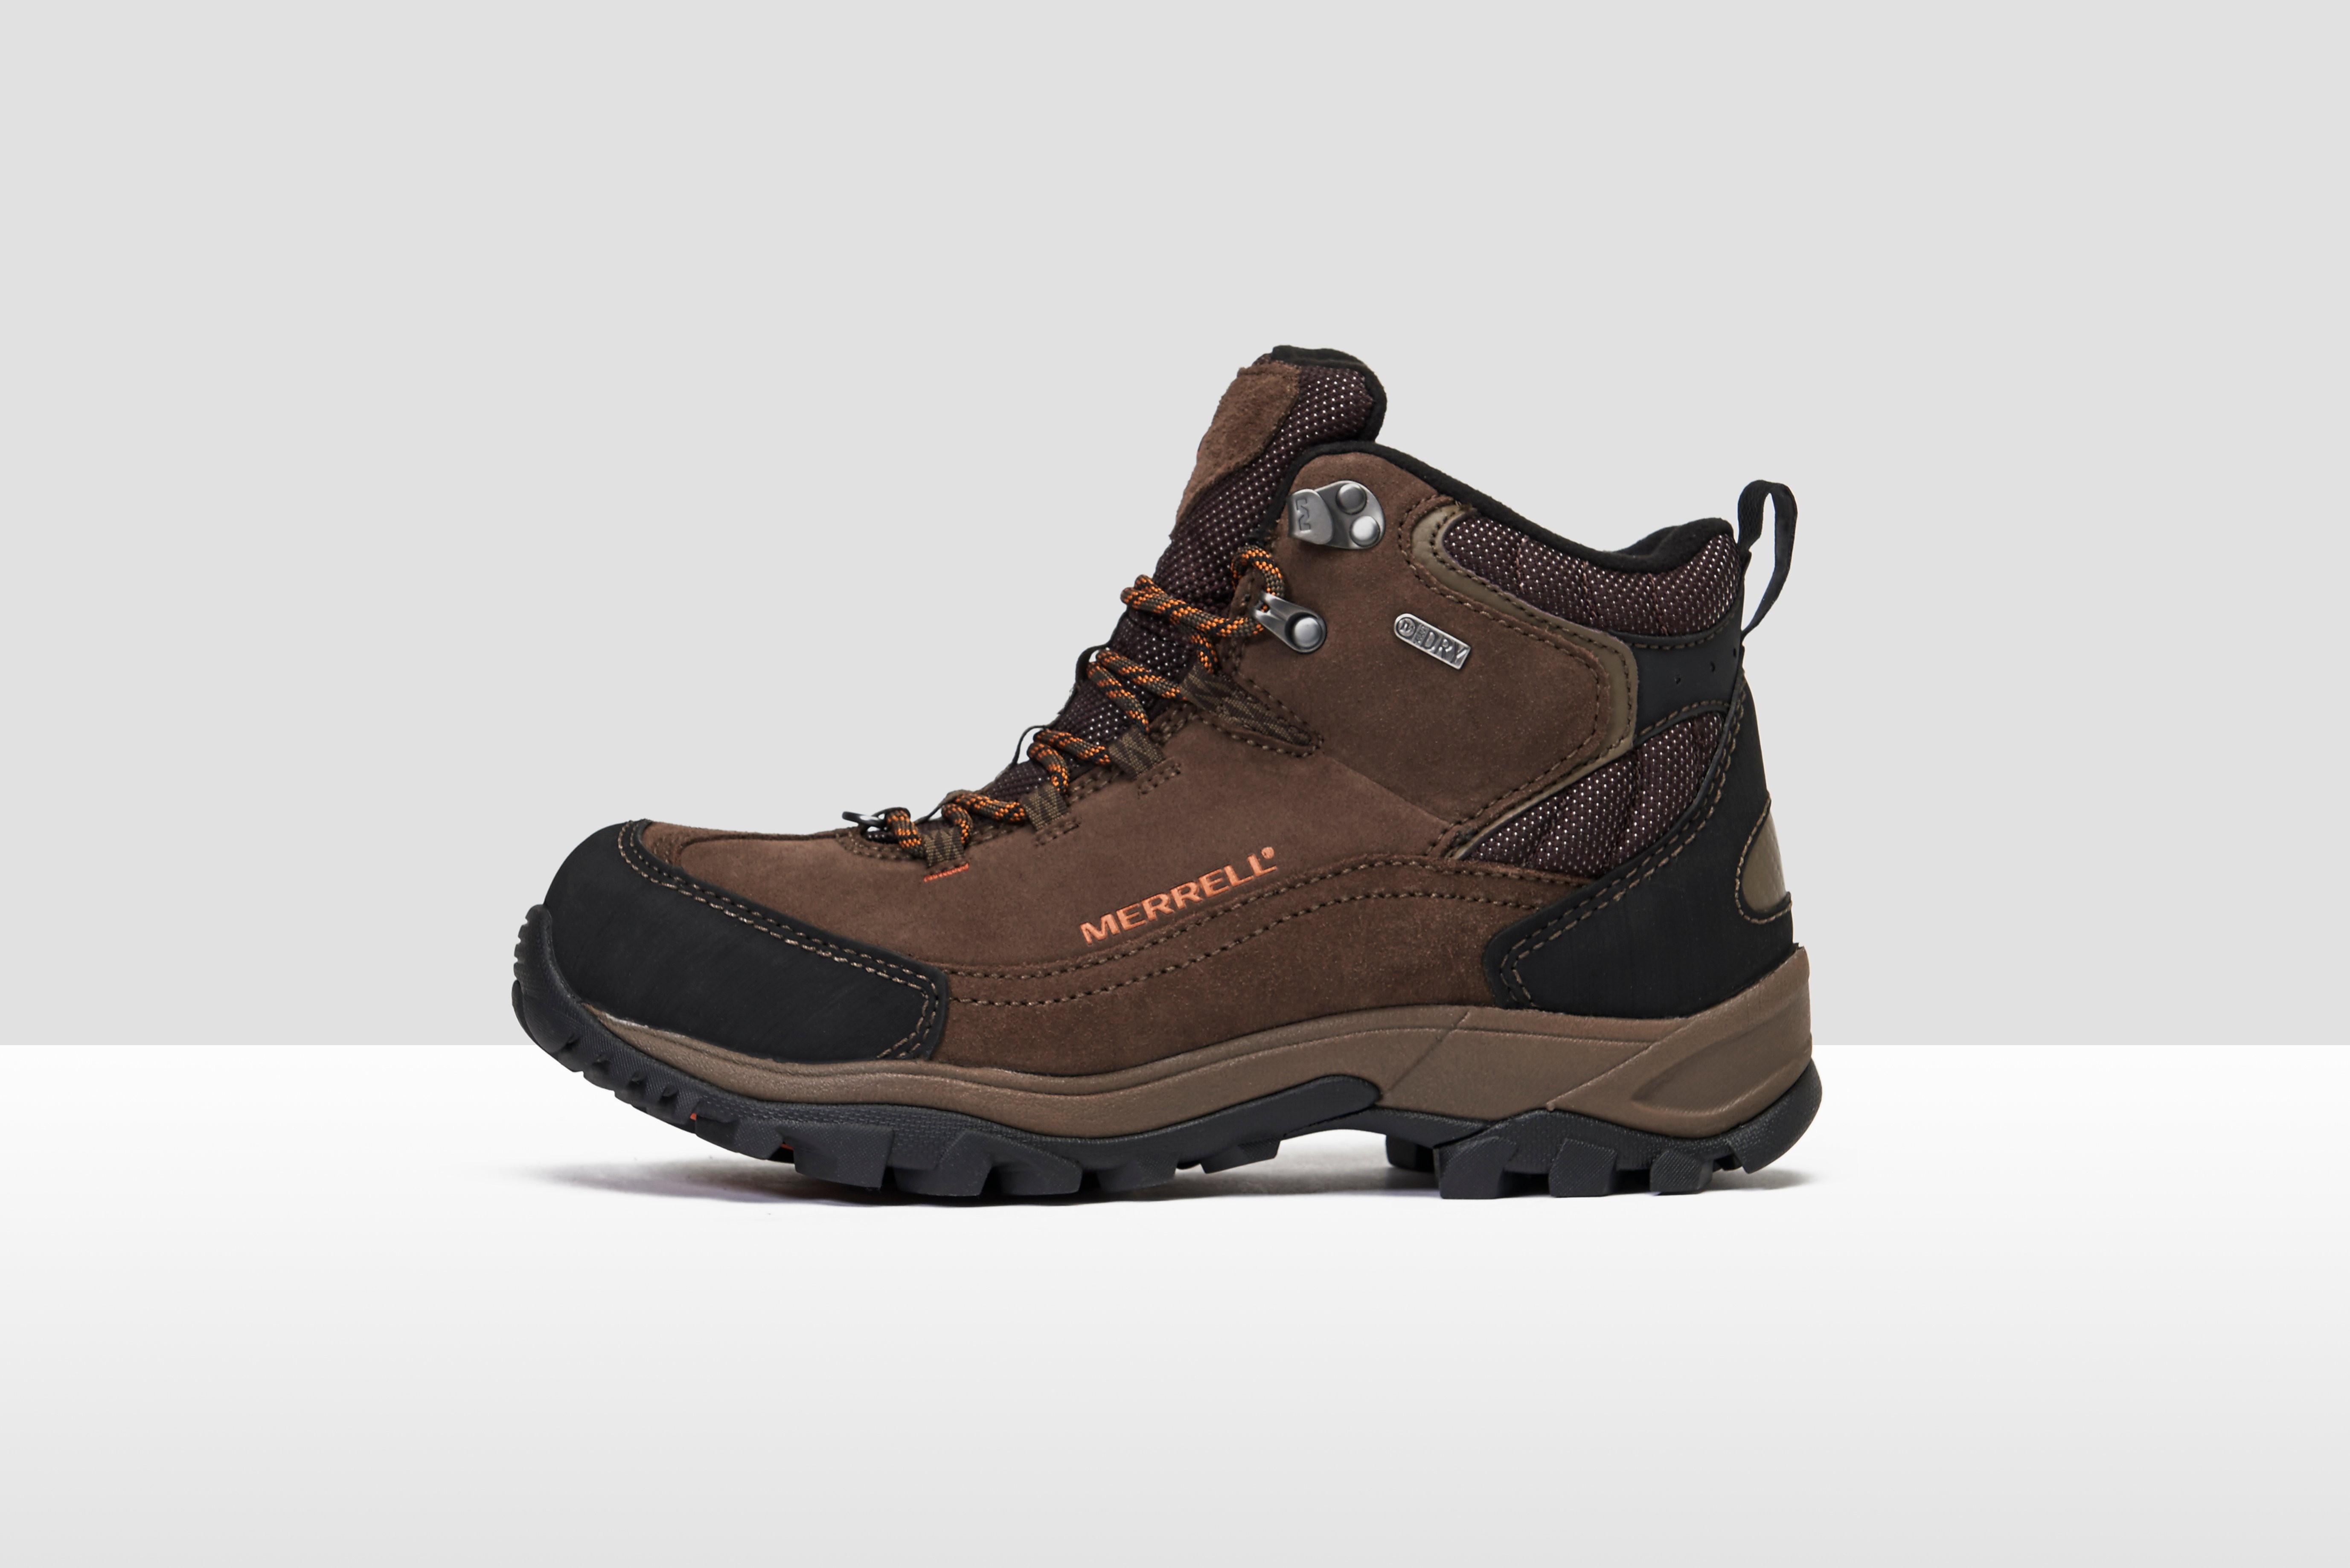 Merrell Norsehund Omega Mid Waterproof Men's Hiking Boots